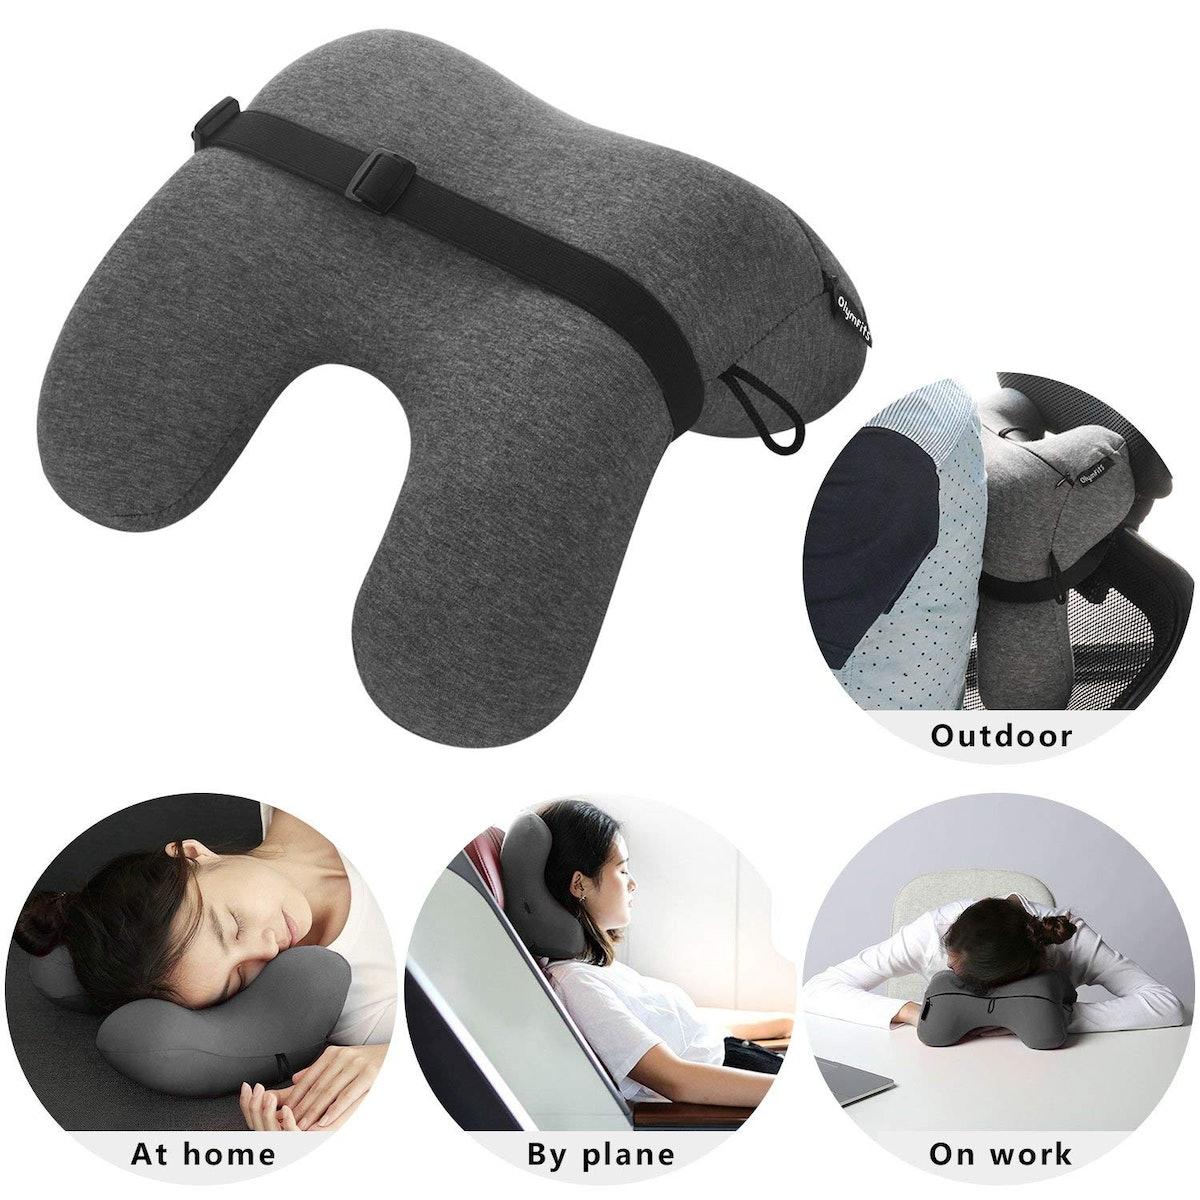 OlymFits Memory Foam Travel Pillow